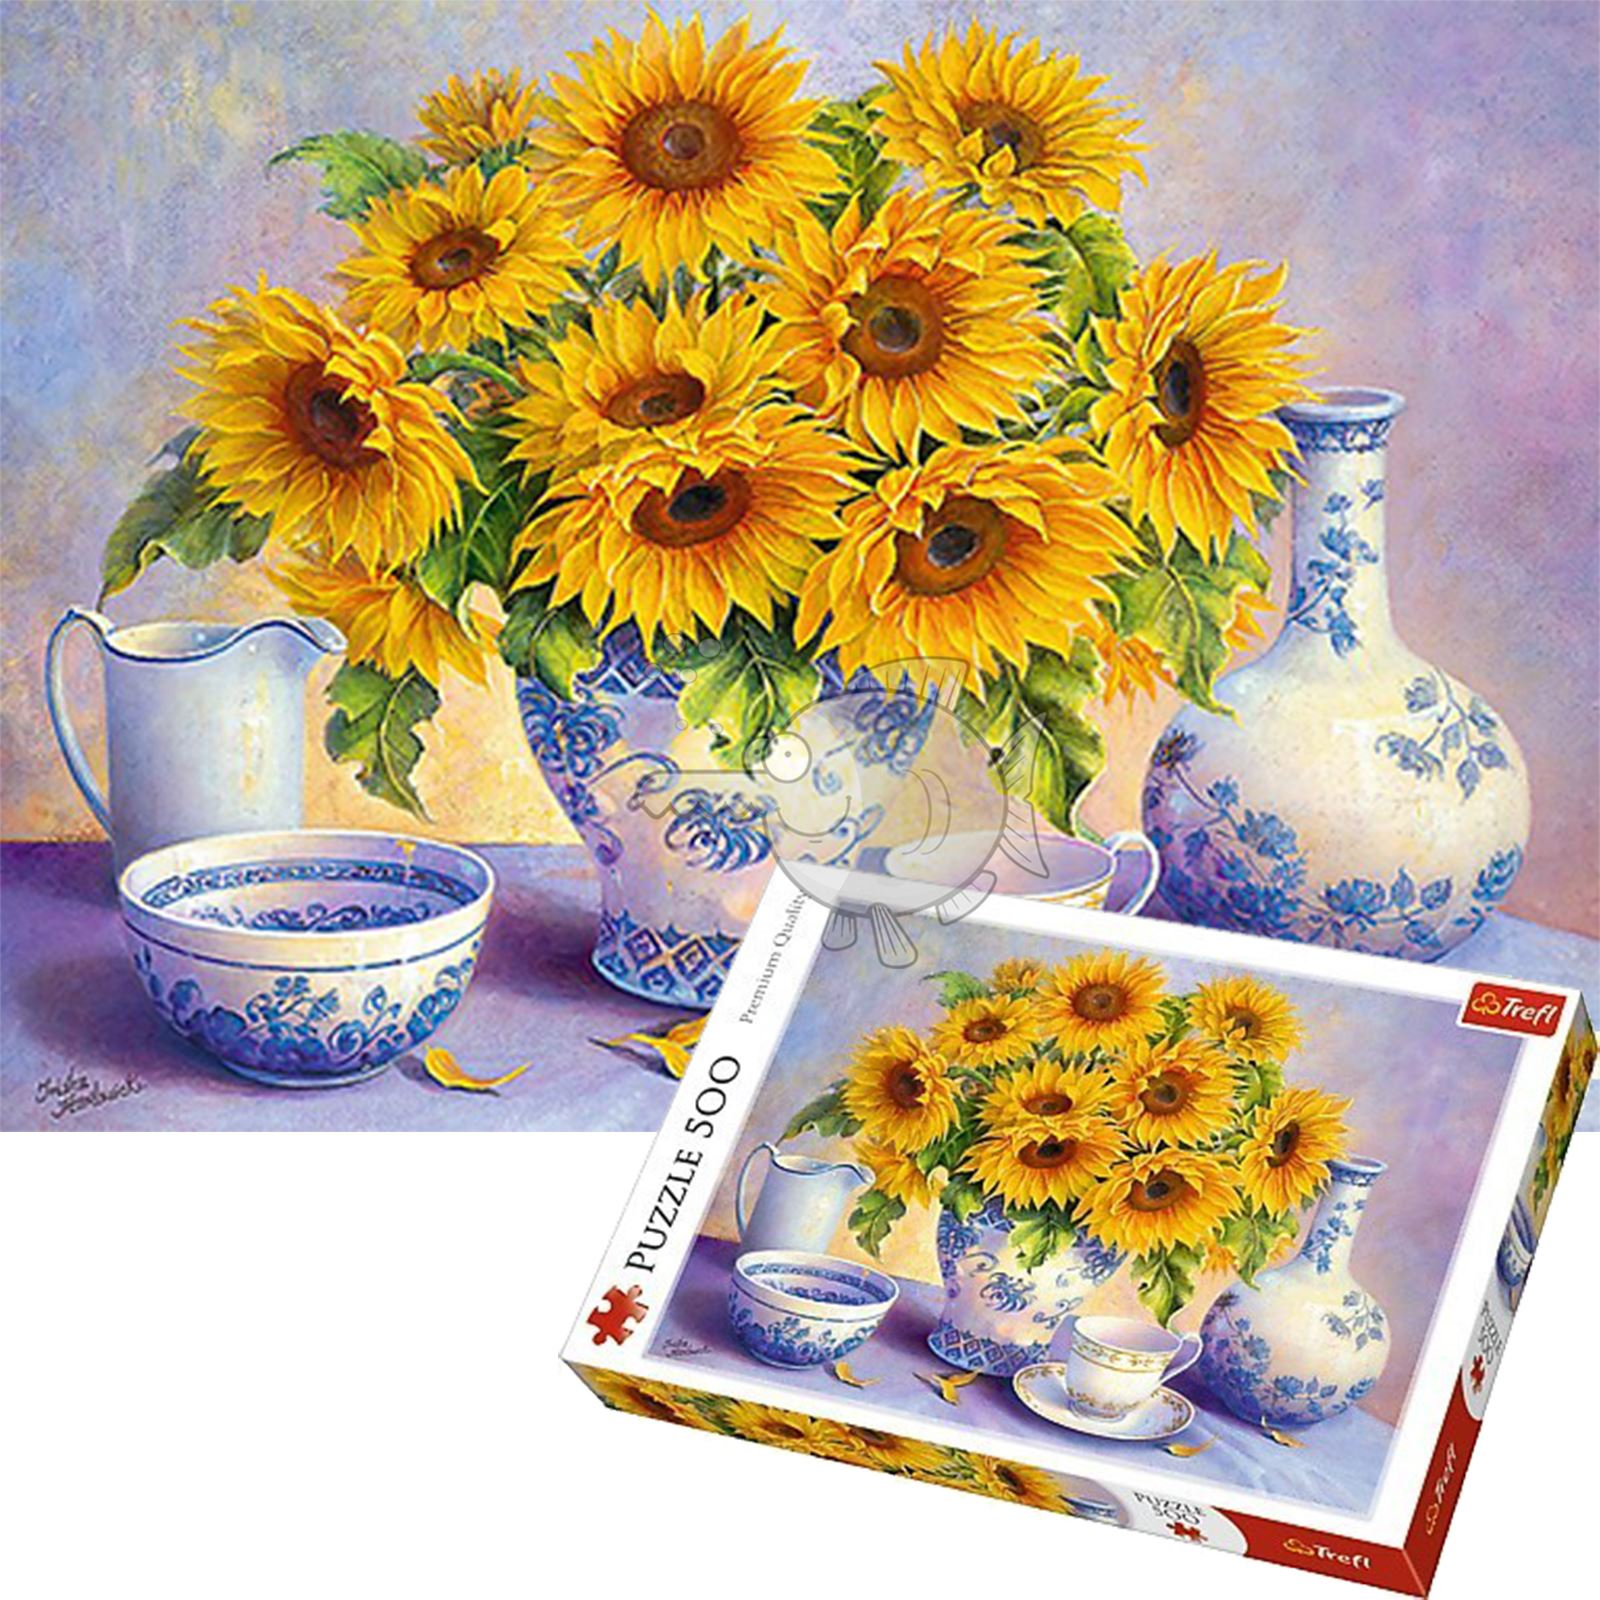 Trefl 500 Piece Kids Large Sunfloweer Boquet Vase Table Floor Jigsaw Puzzle NEW